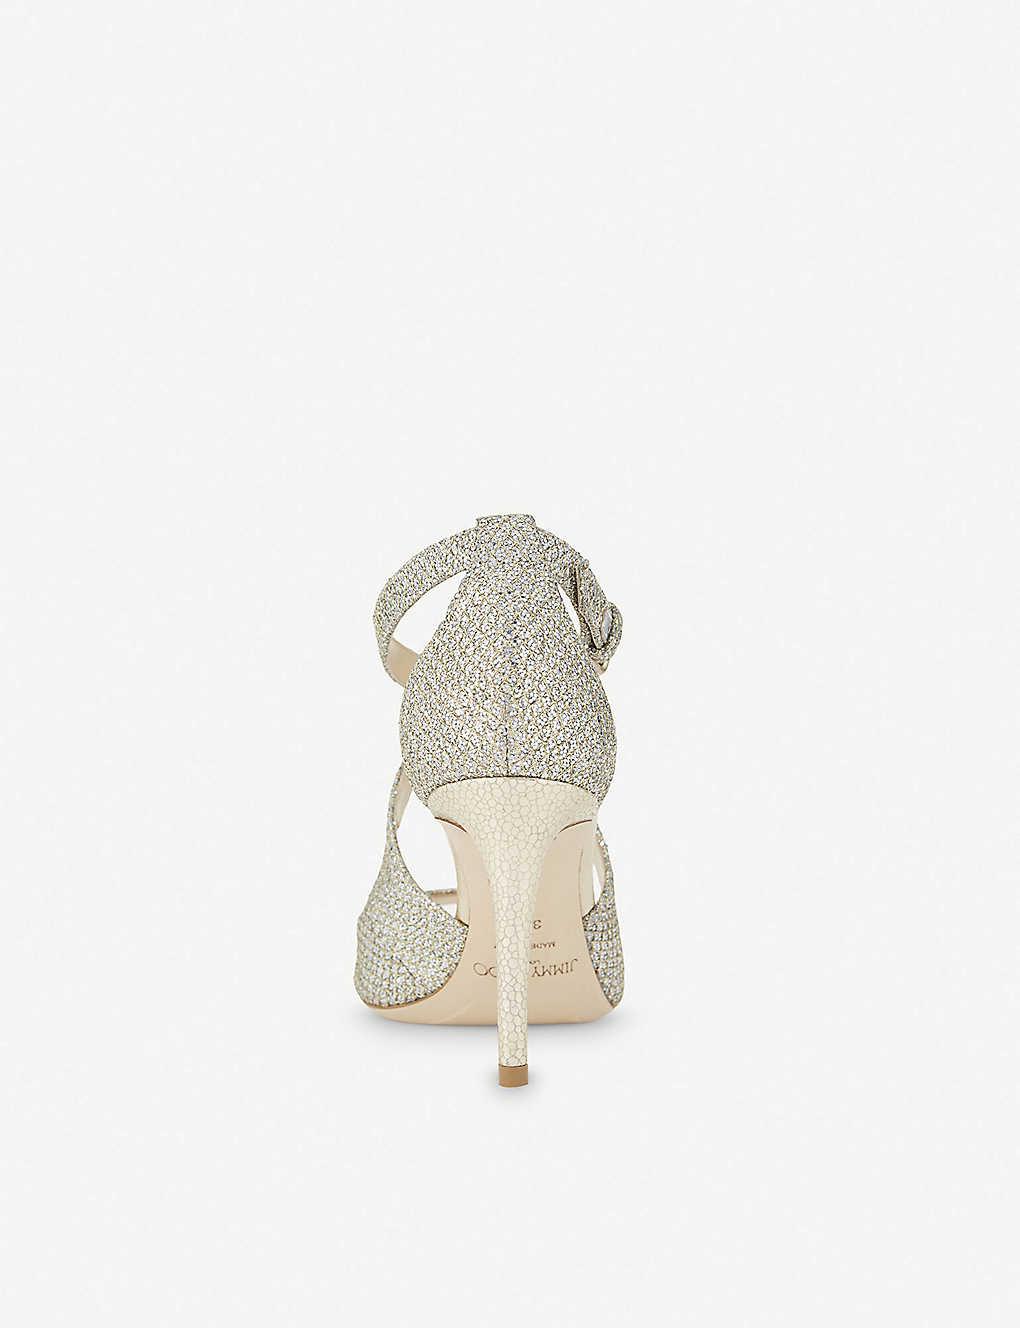 6a8c3d95a4e6 ... Emily 85 champagne glitter heeled sandals - Champagne ...